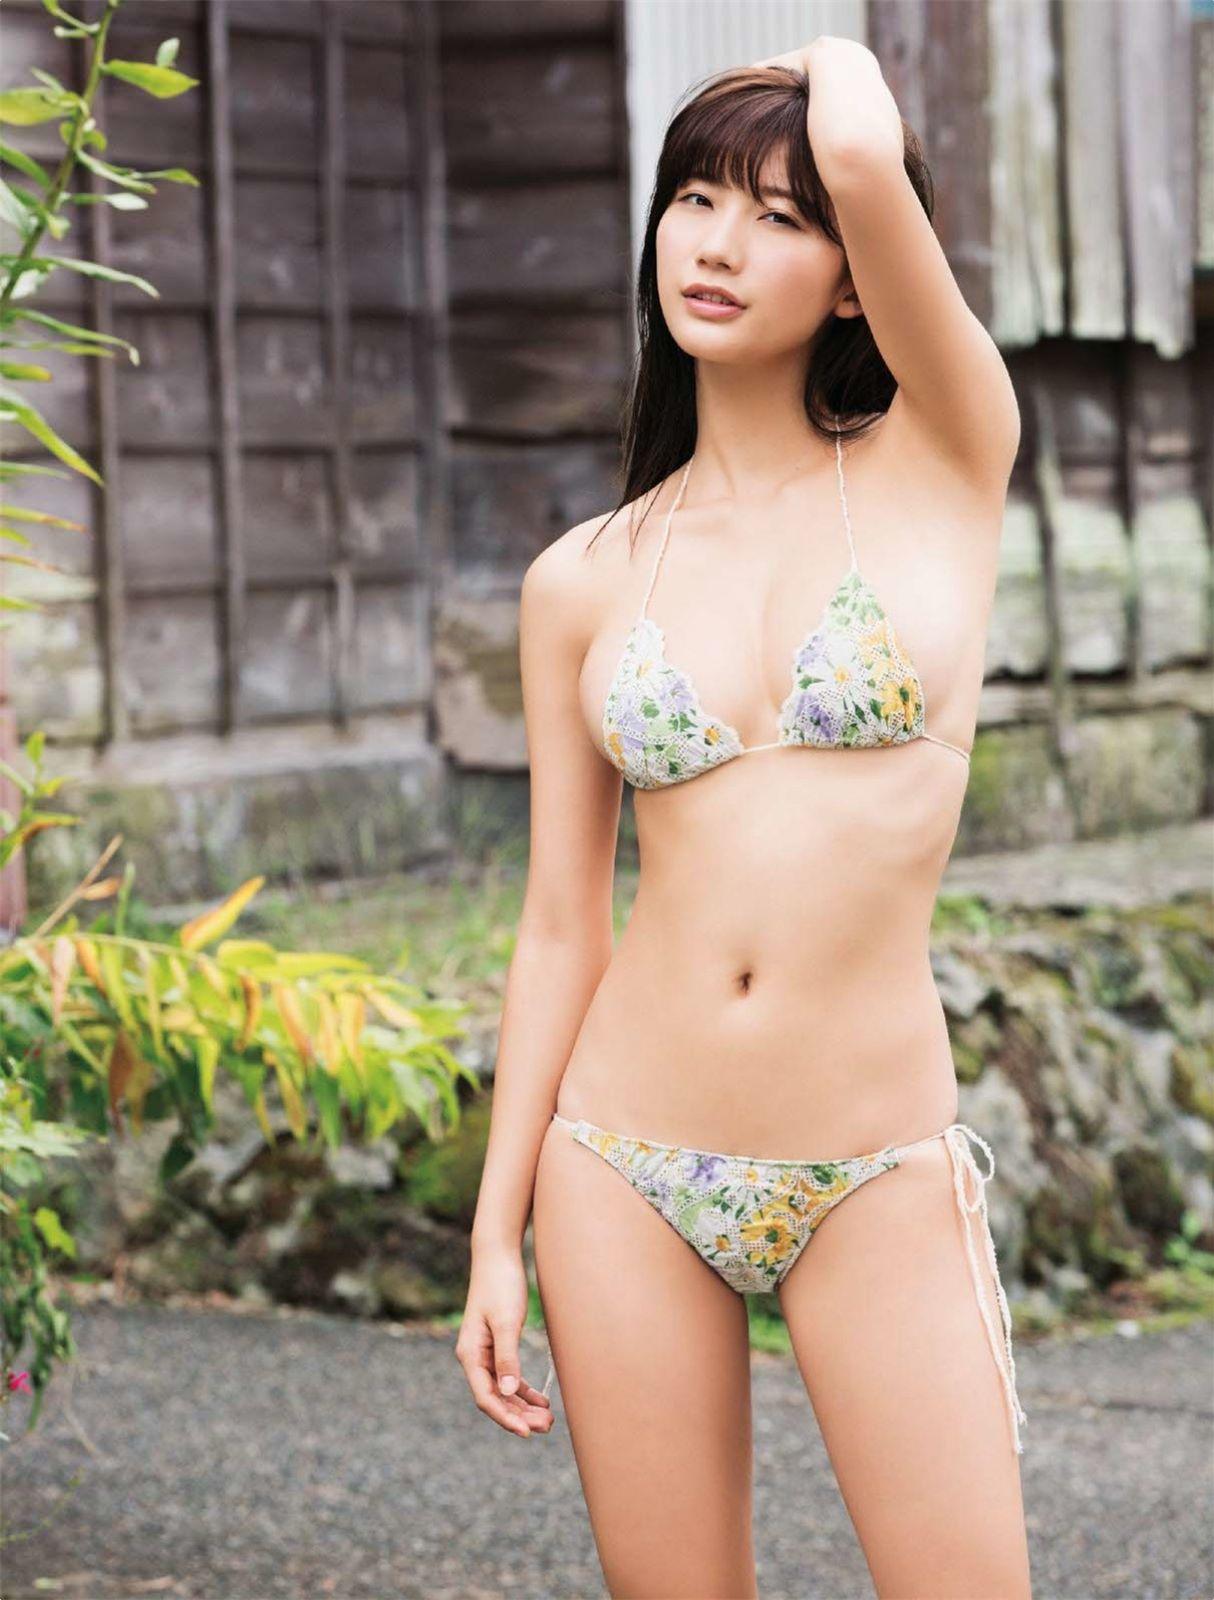 Yuka Ogura 小倉優香, Shukan SPA! 2017.10.24 (週刊スパ 2017年10月24日号)